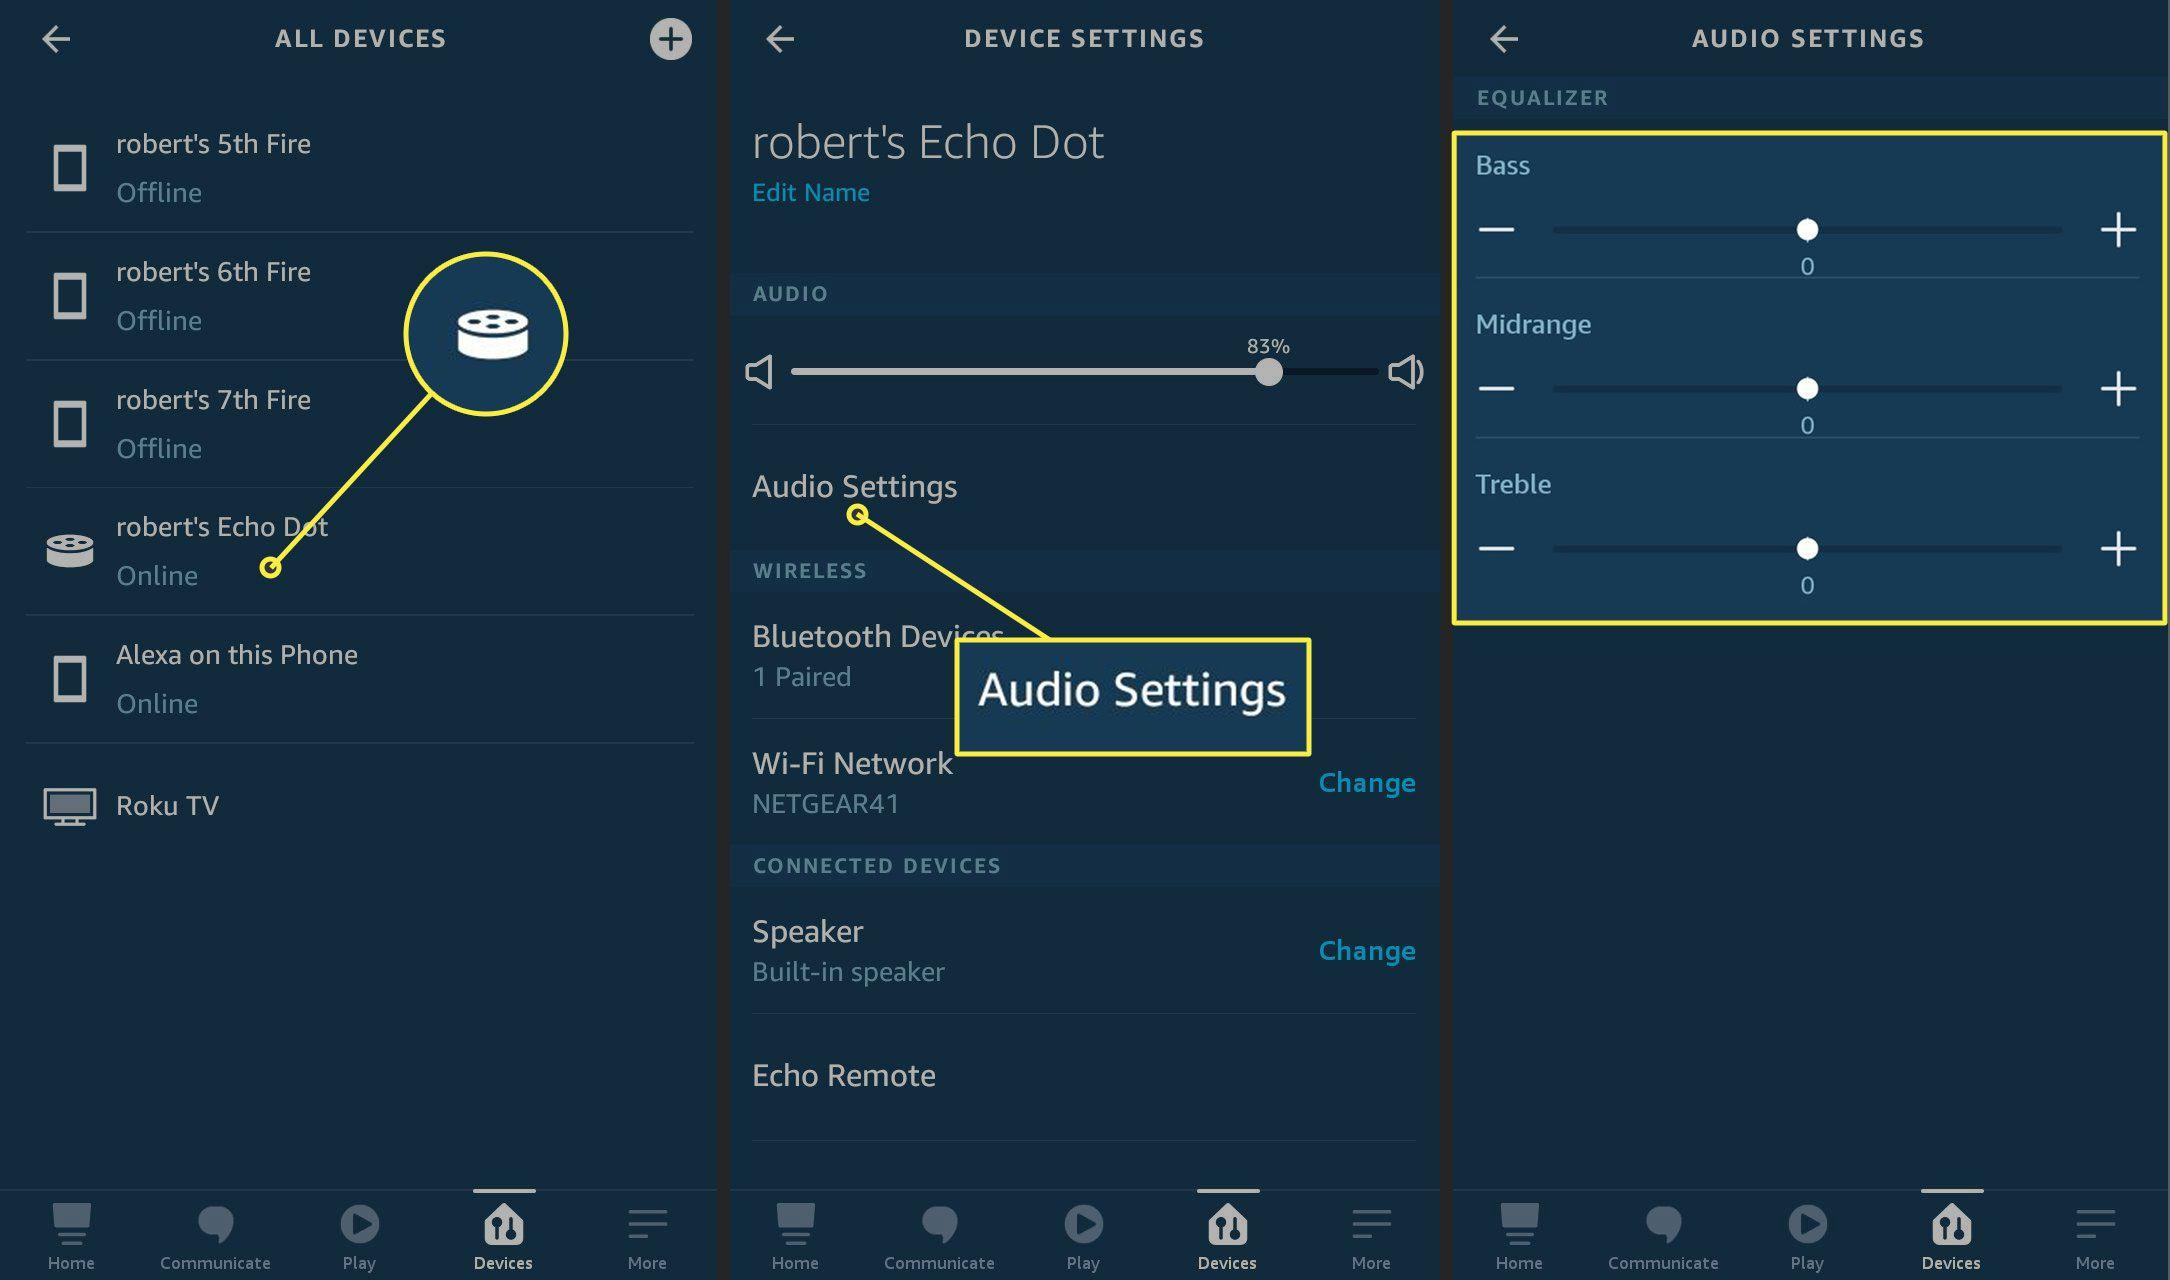 Audio Settings in the Alexa app